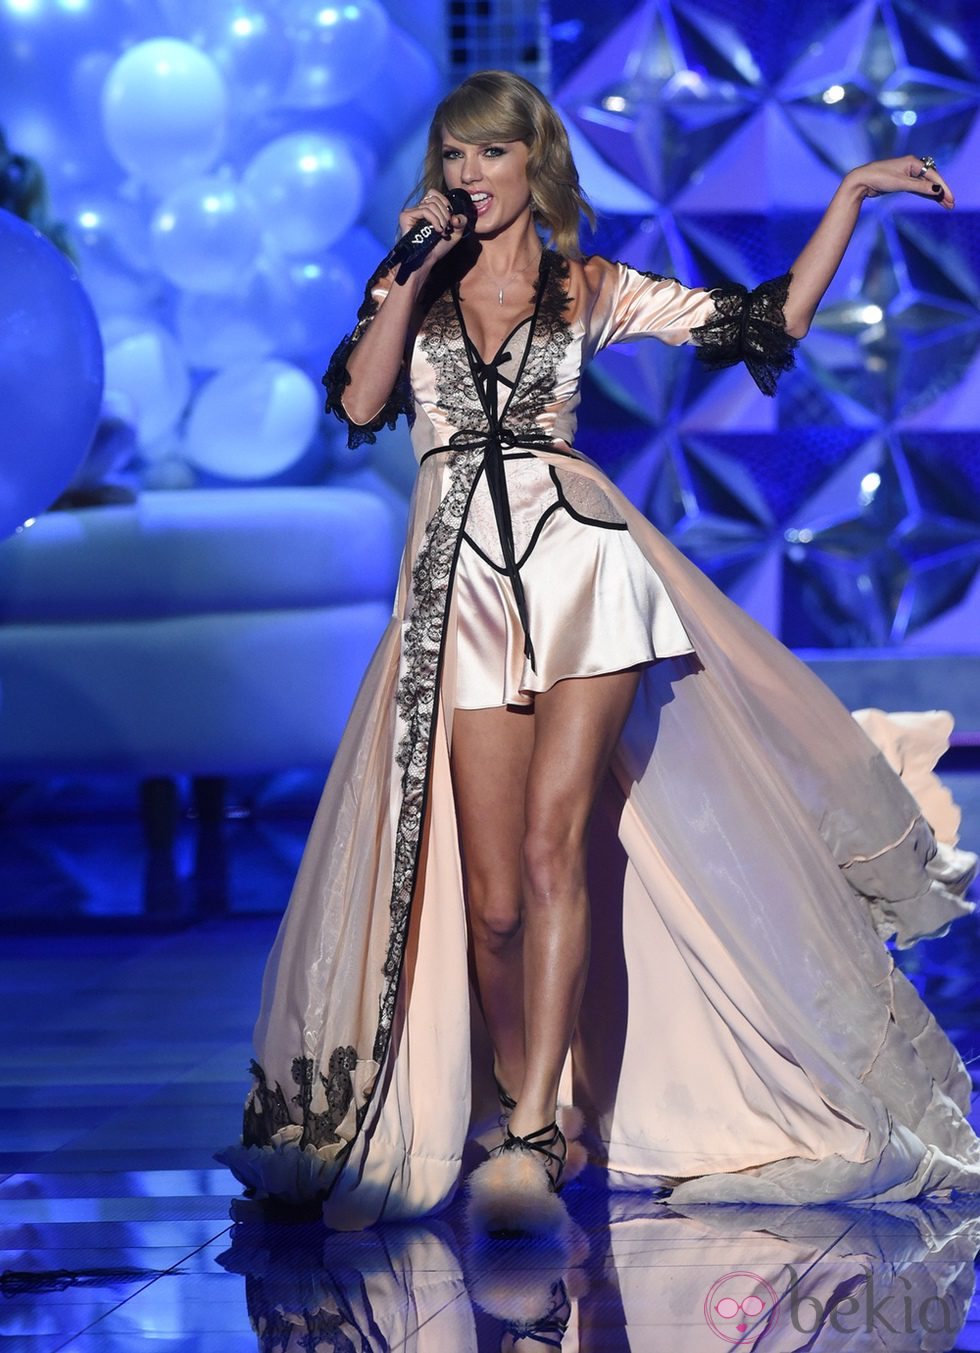 Taylor swift actuando en la pasarela de 39 victoria 39 s secret fashion show 2014 39 victoria 39 s Taylor swift style live vs fashion show